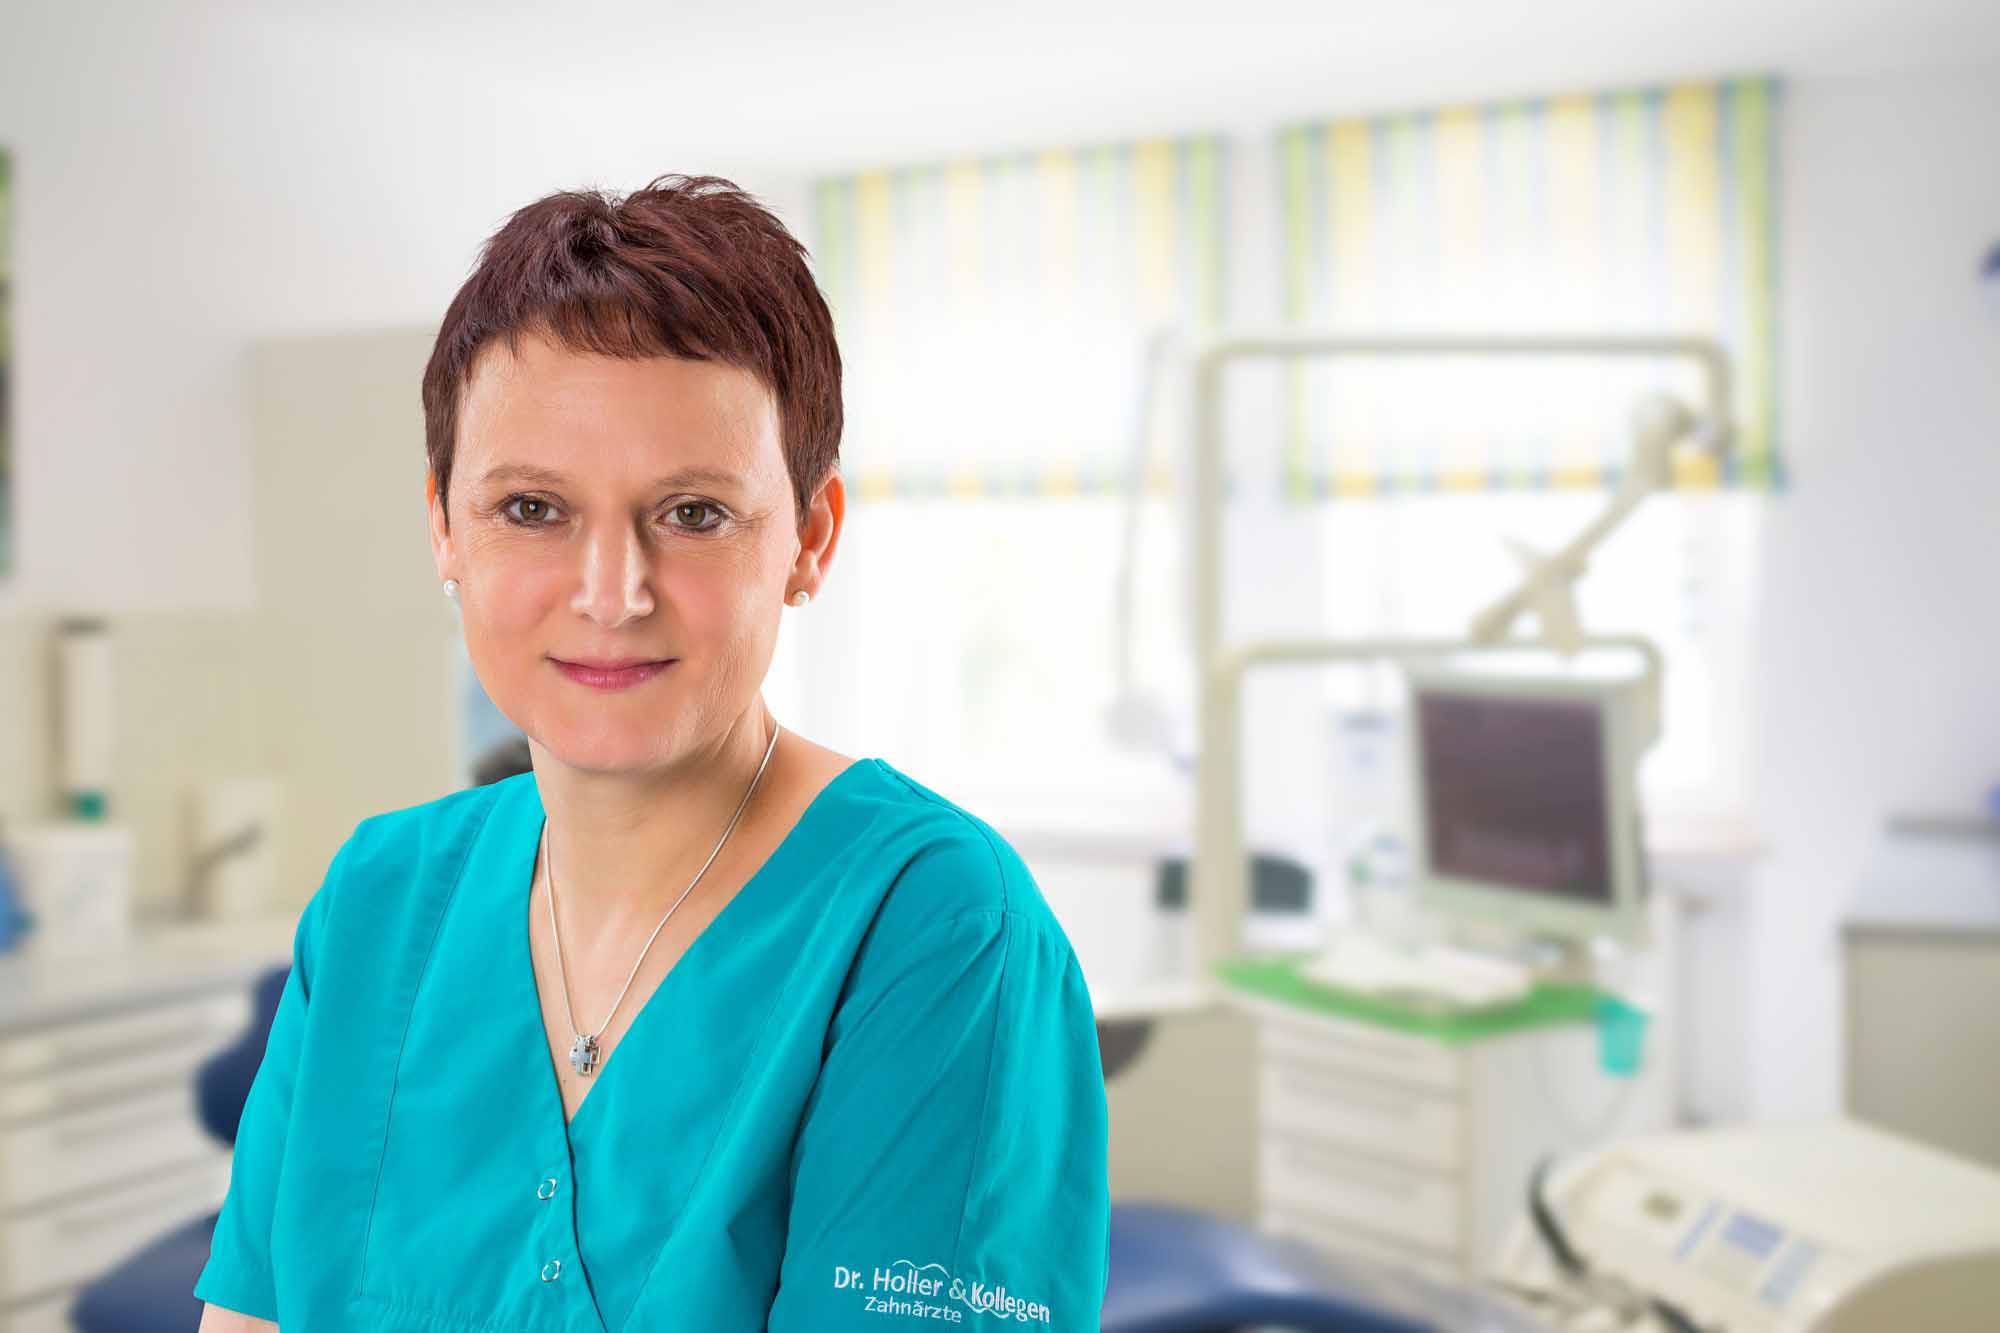 Marina Reißmann